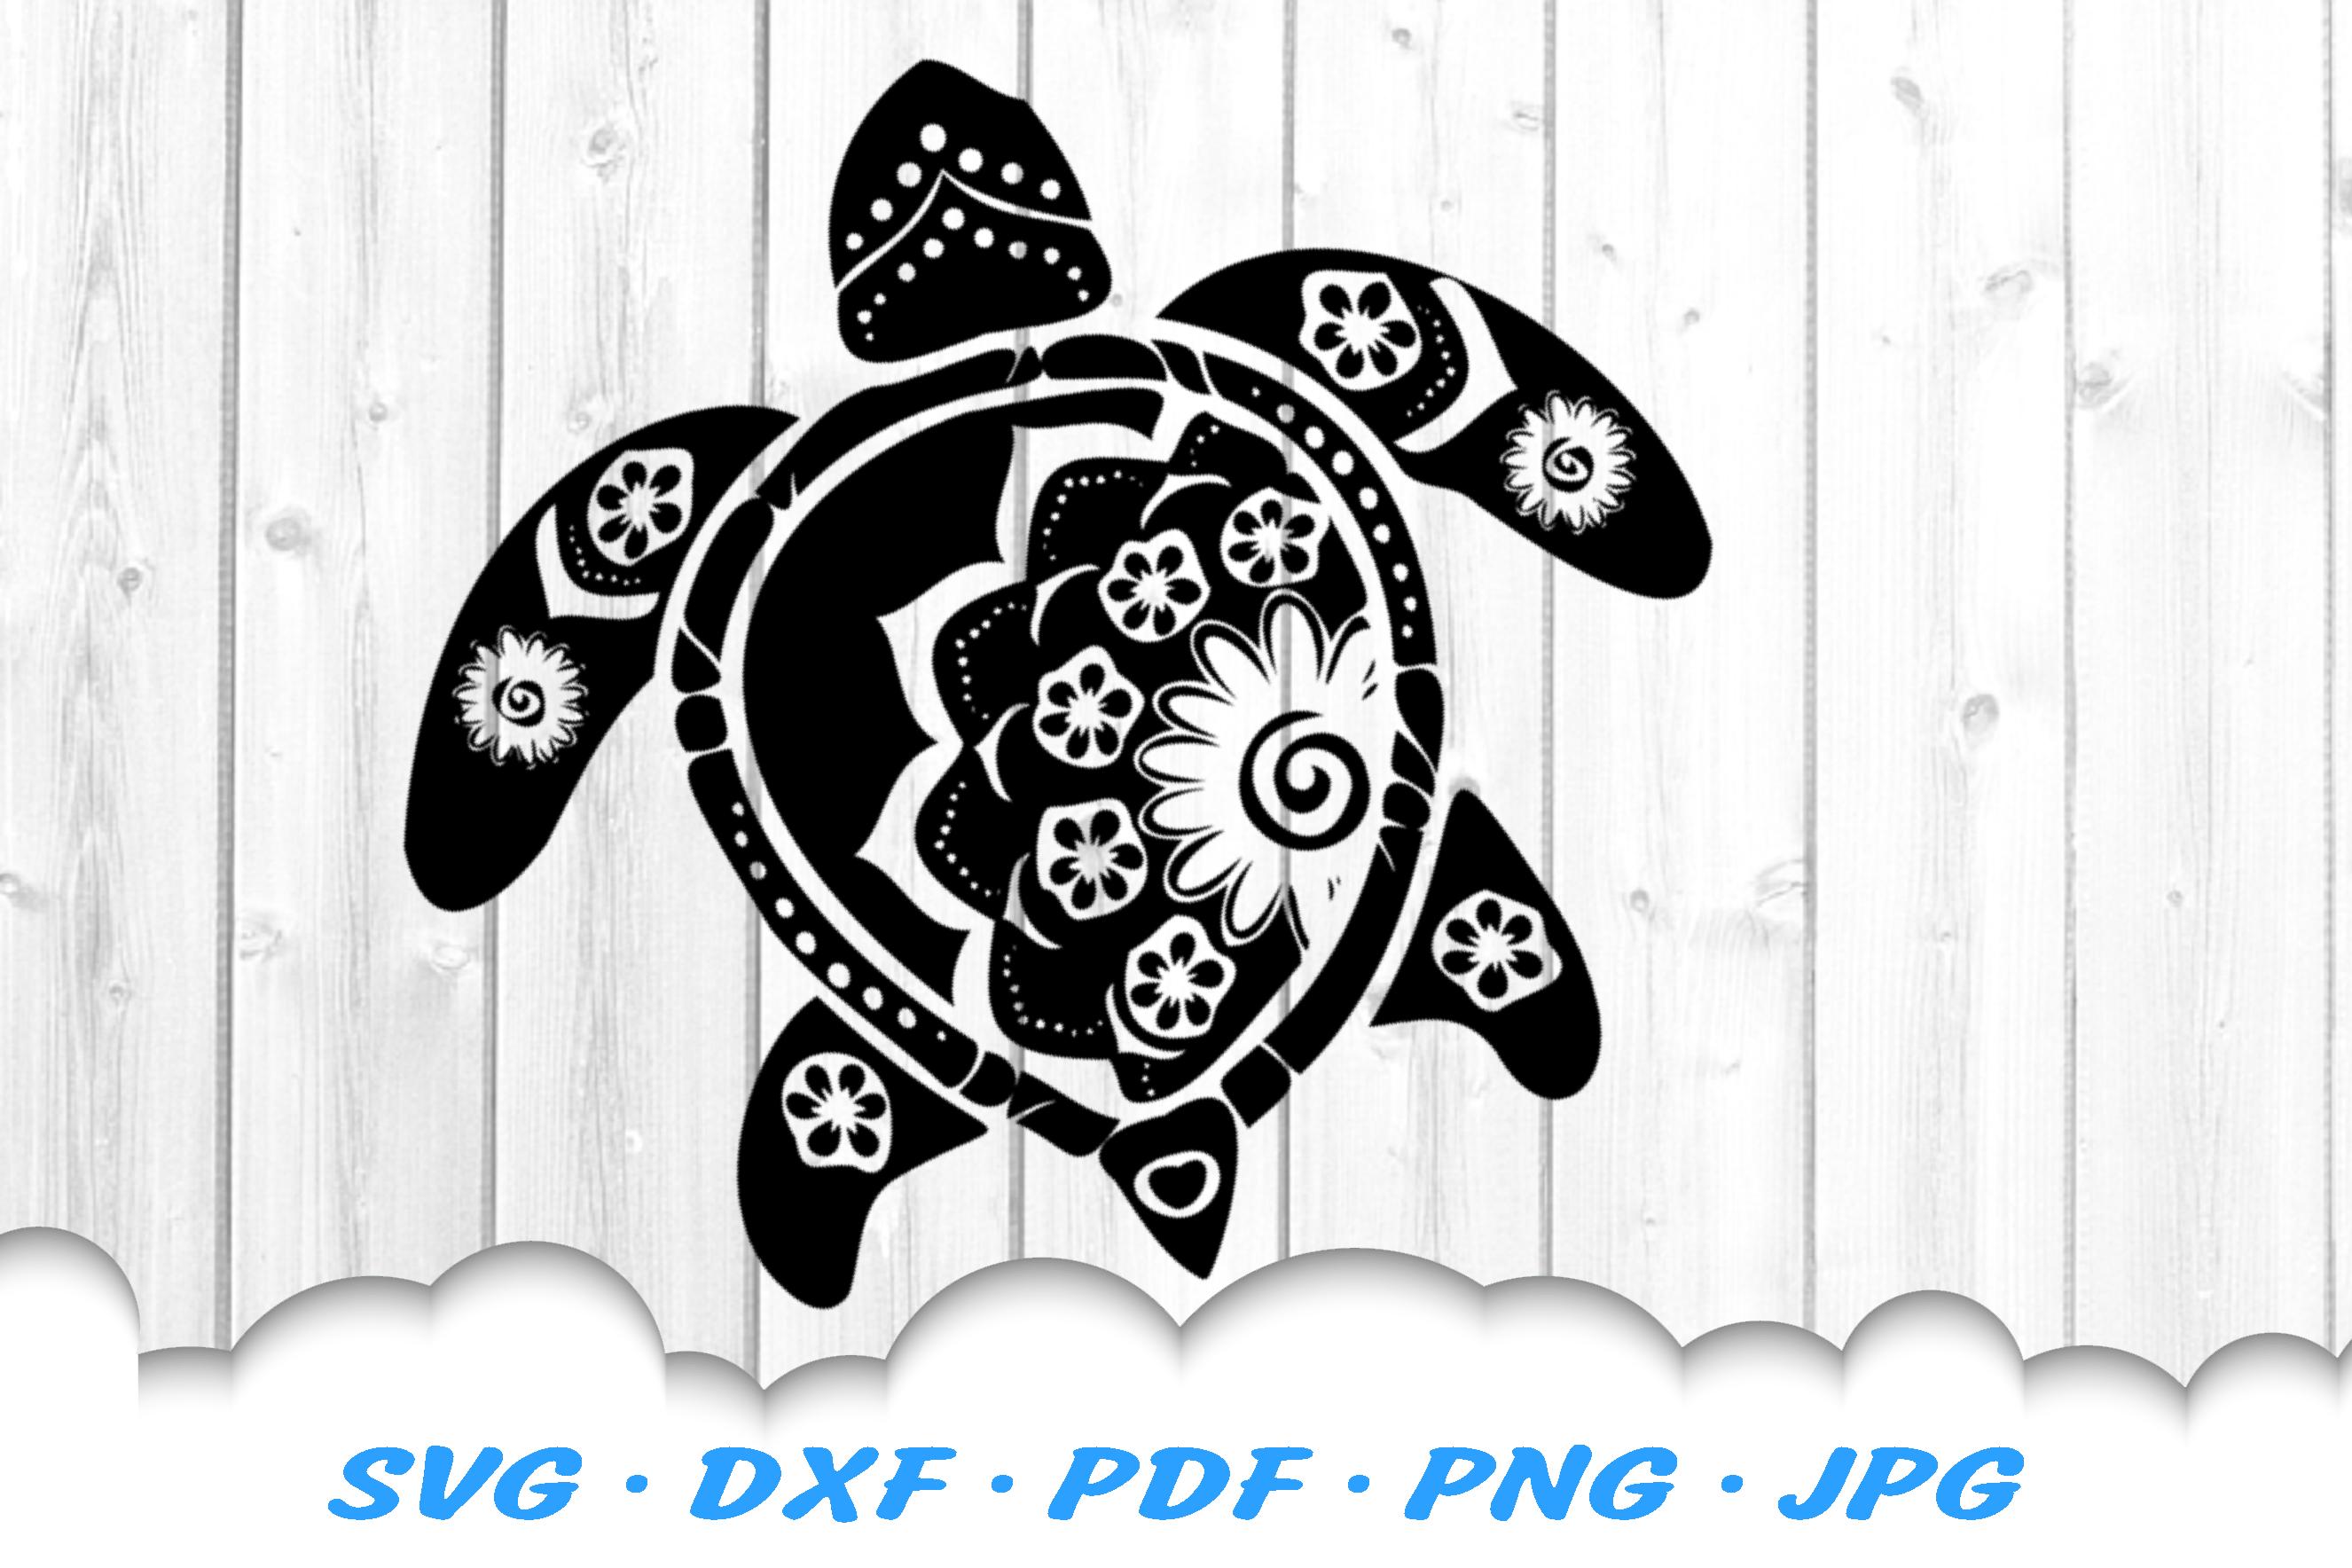 Mandala Floral Sea Turtle SVG DXF Cut Files example image 2